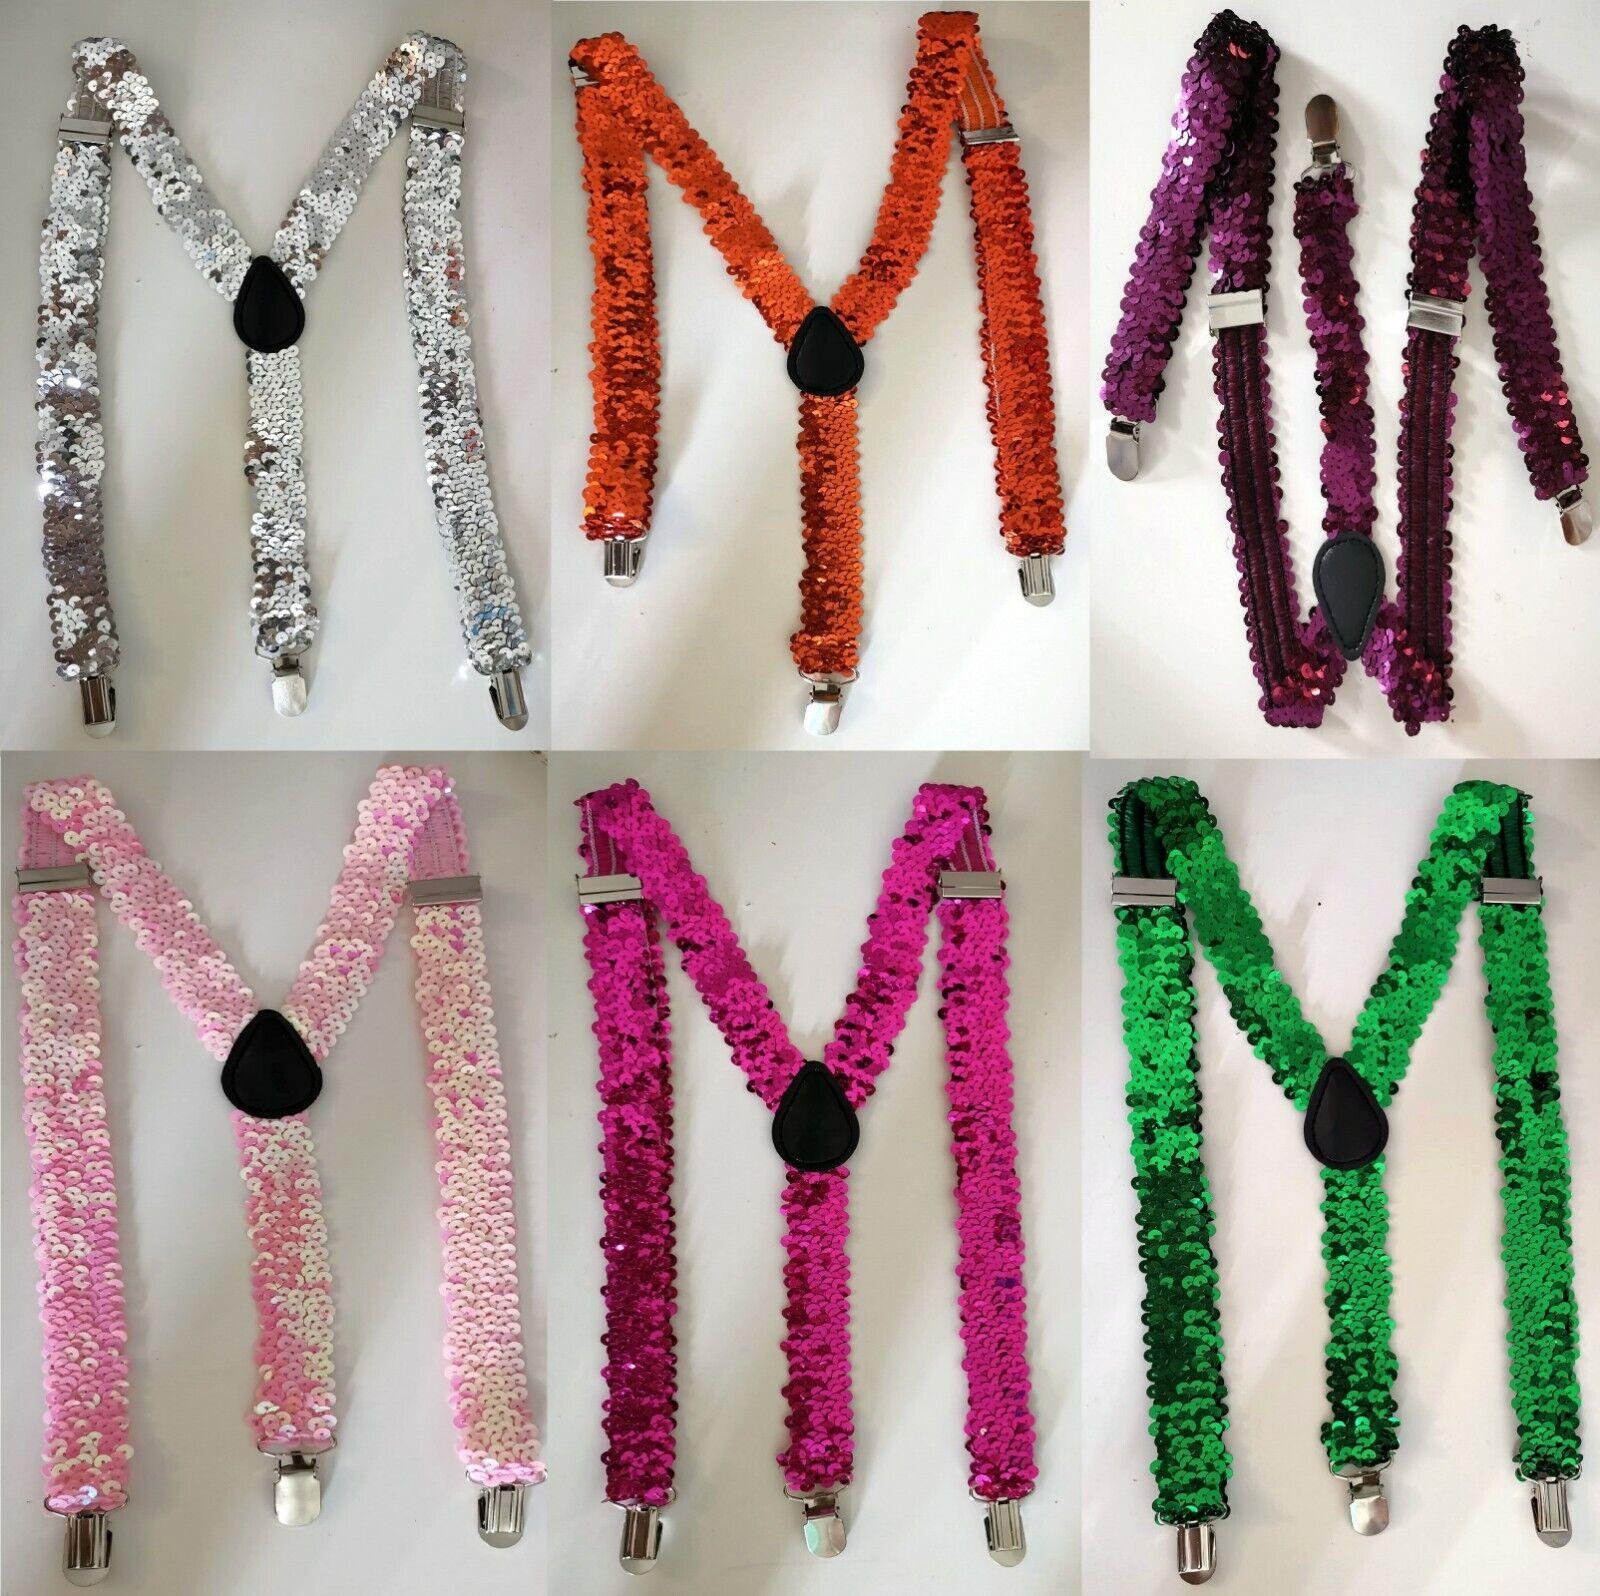 Unisex Men's Women's Adjustable Braces Suspender Glitter Sparkly Sequin Party